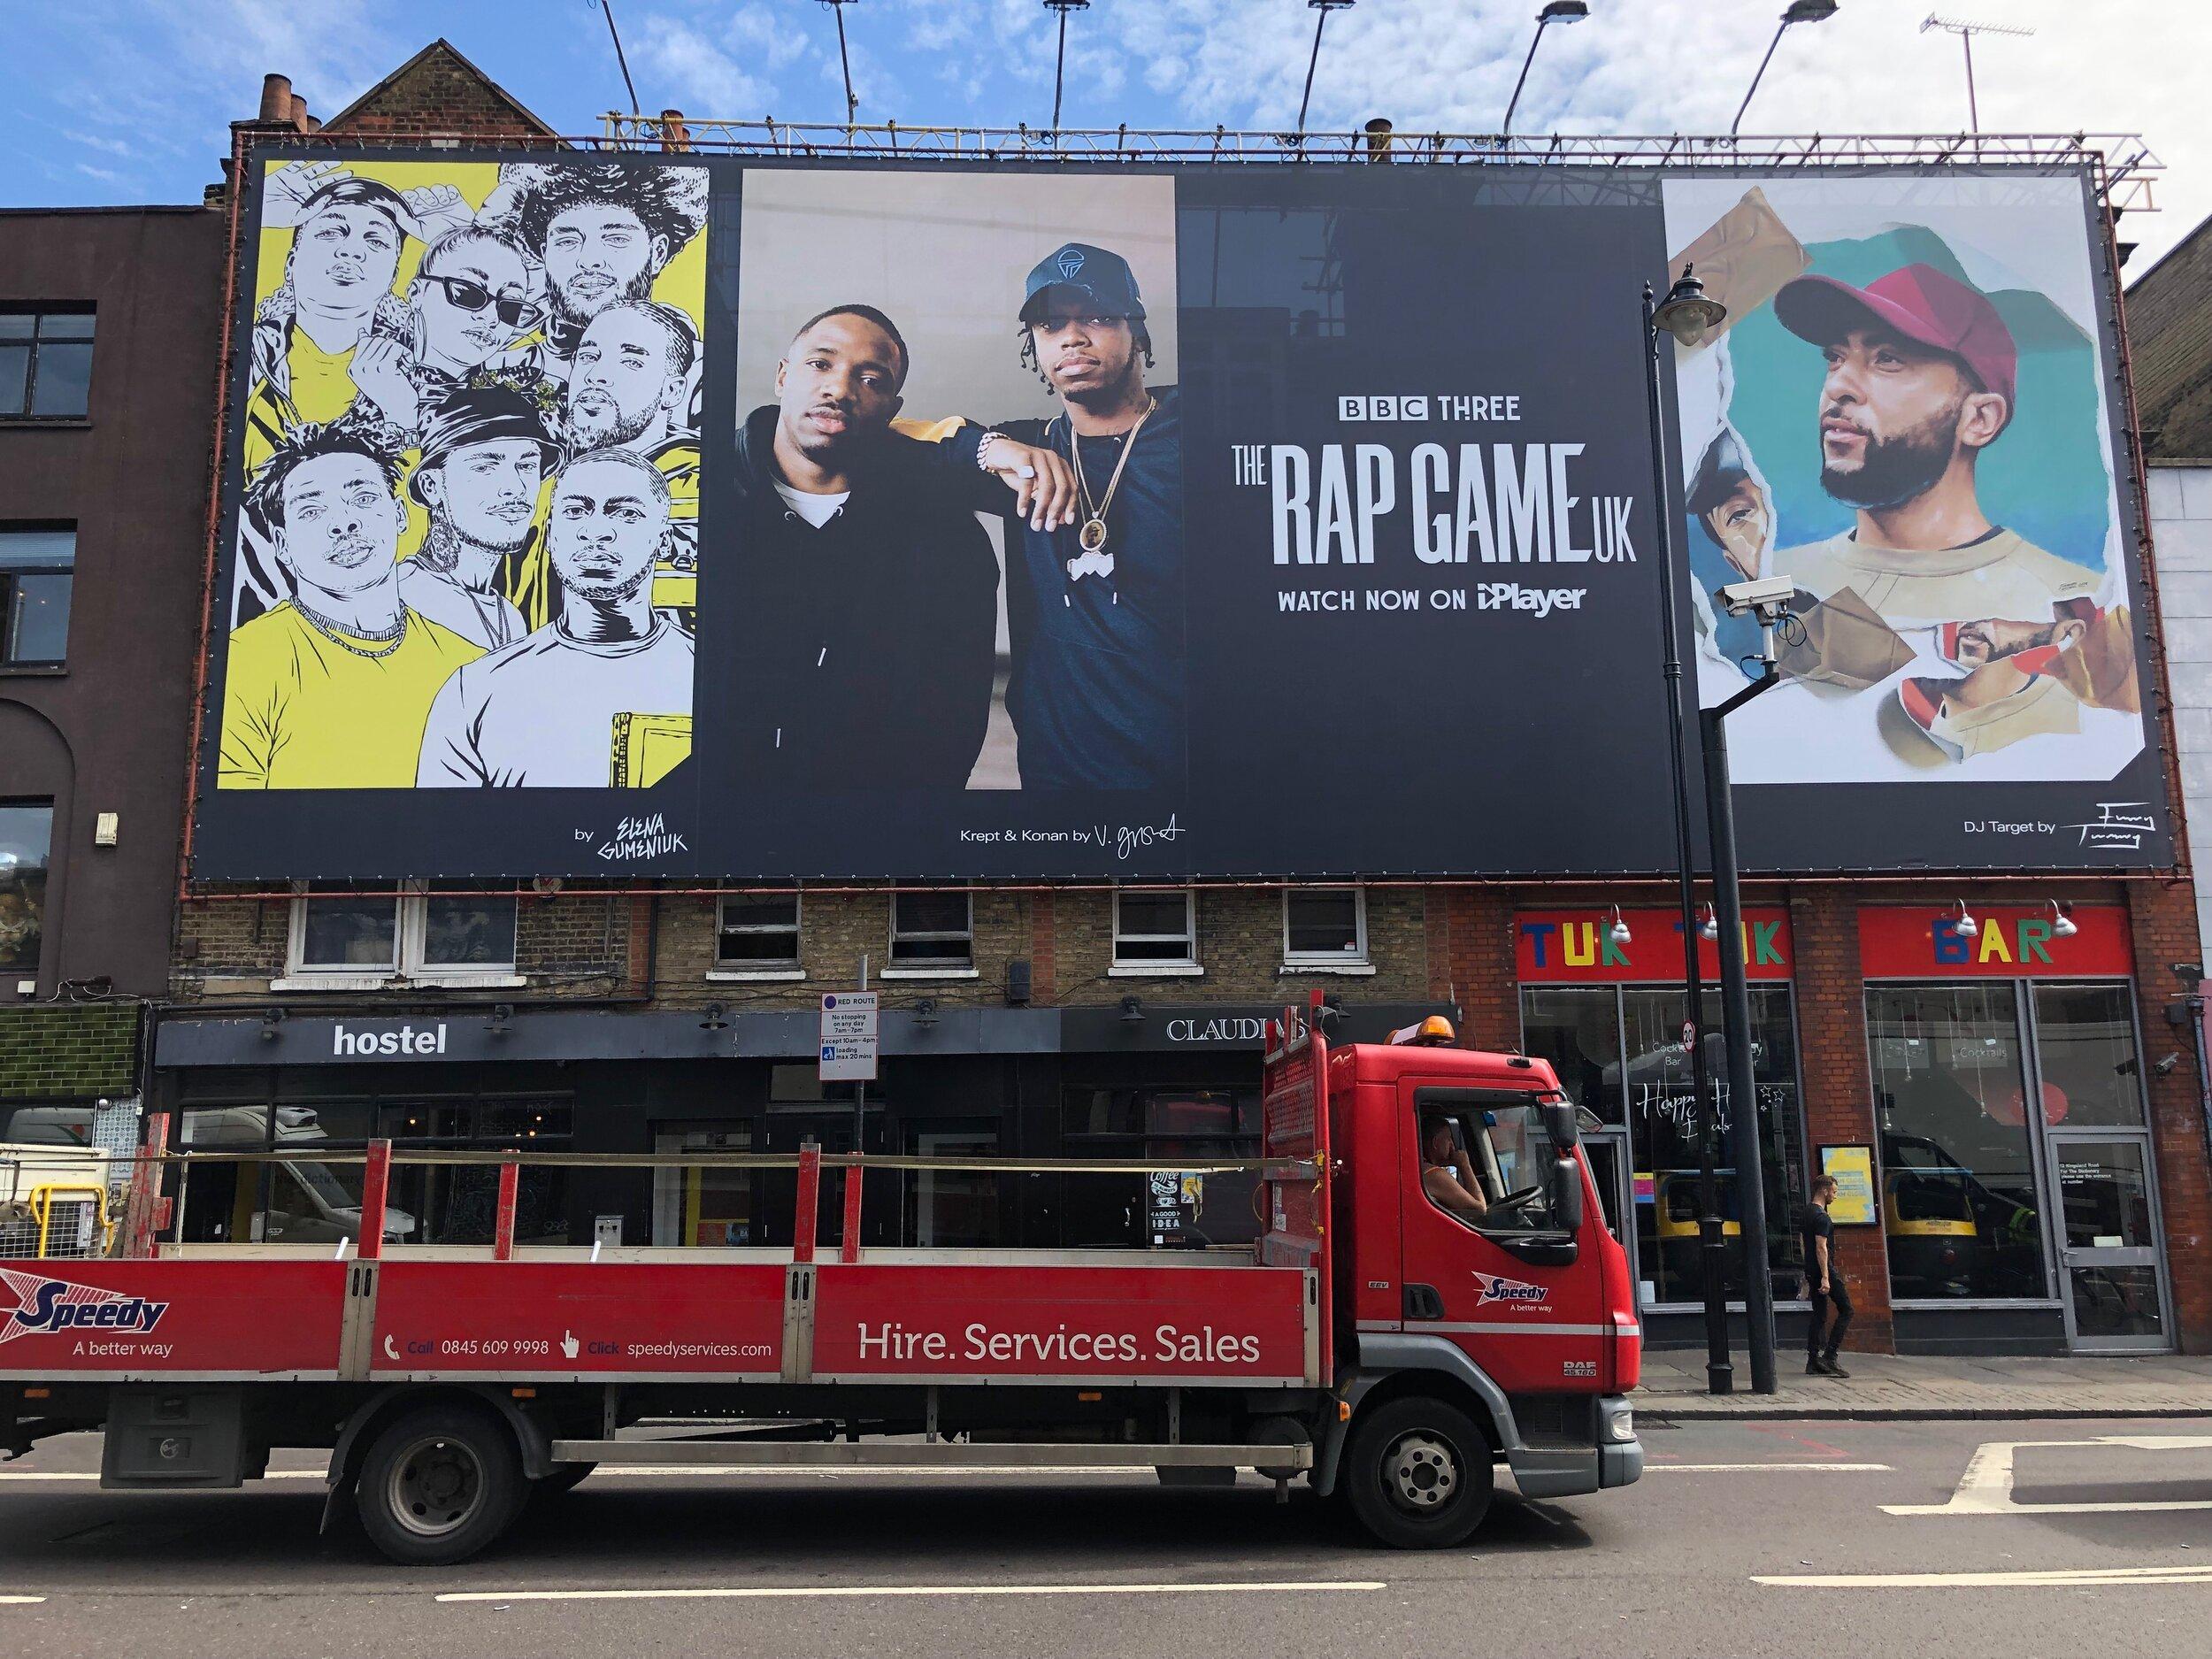 Elena Gumeniuk for The Rap Game UK - Advertising featured on Kingsland Road, London, UK.